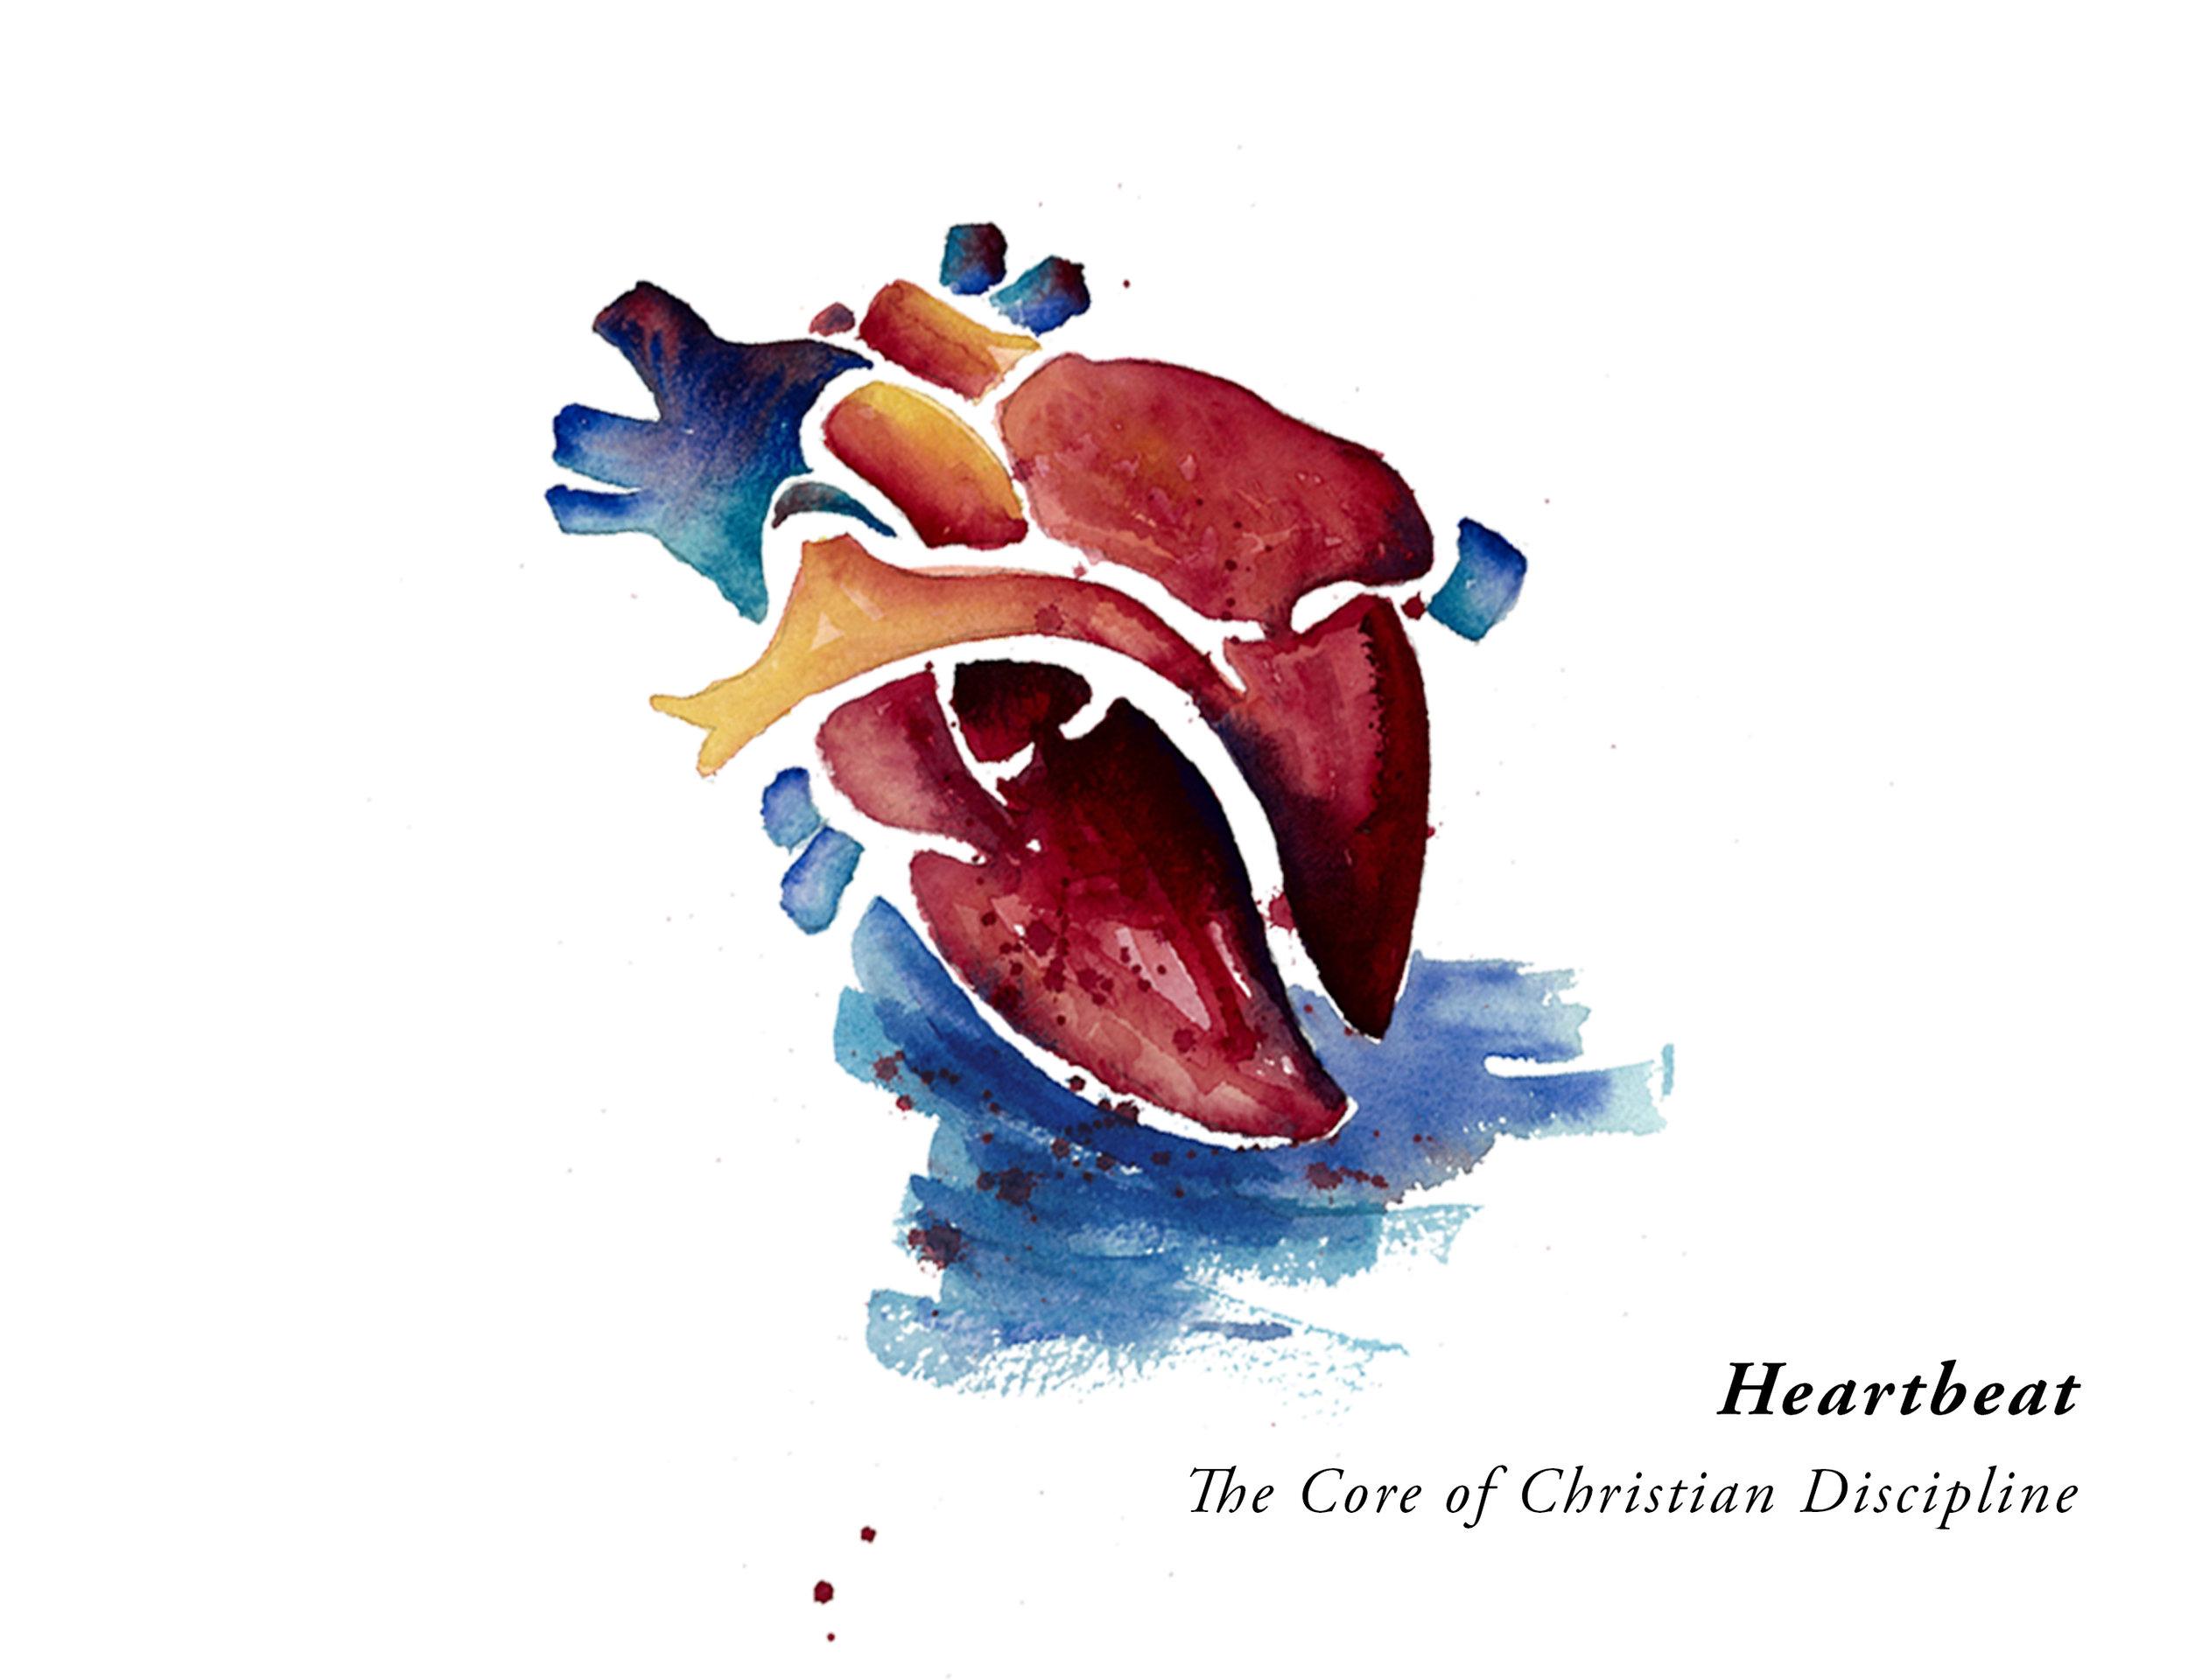 Heartbeat-sermon-roots-community-church-seattle